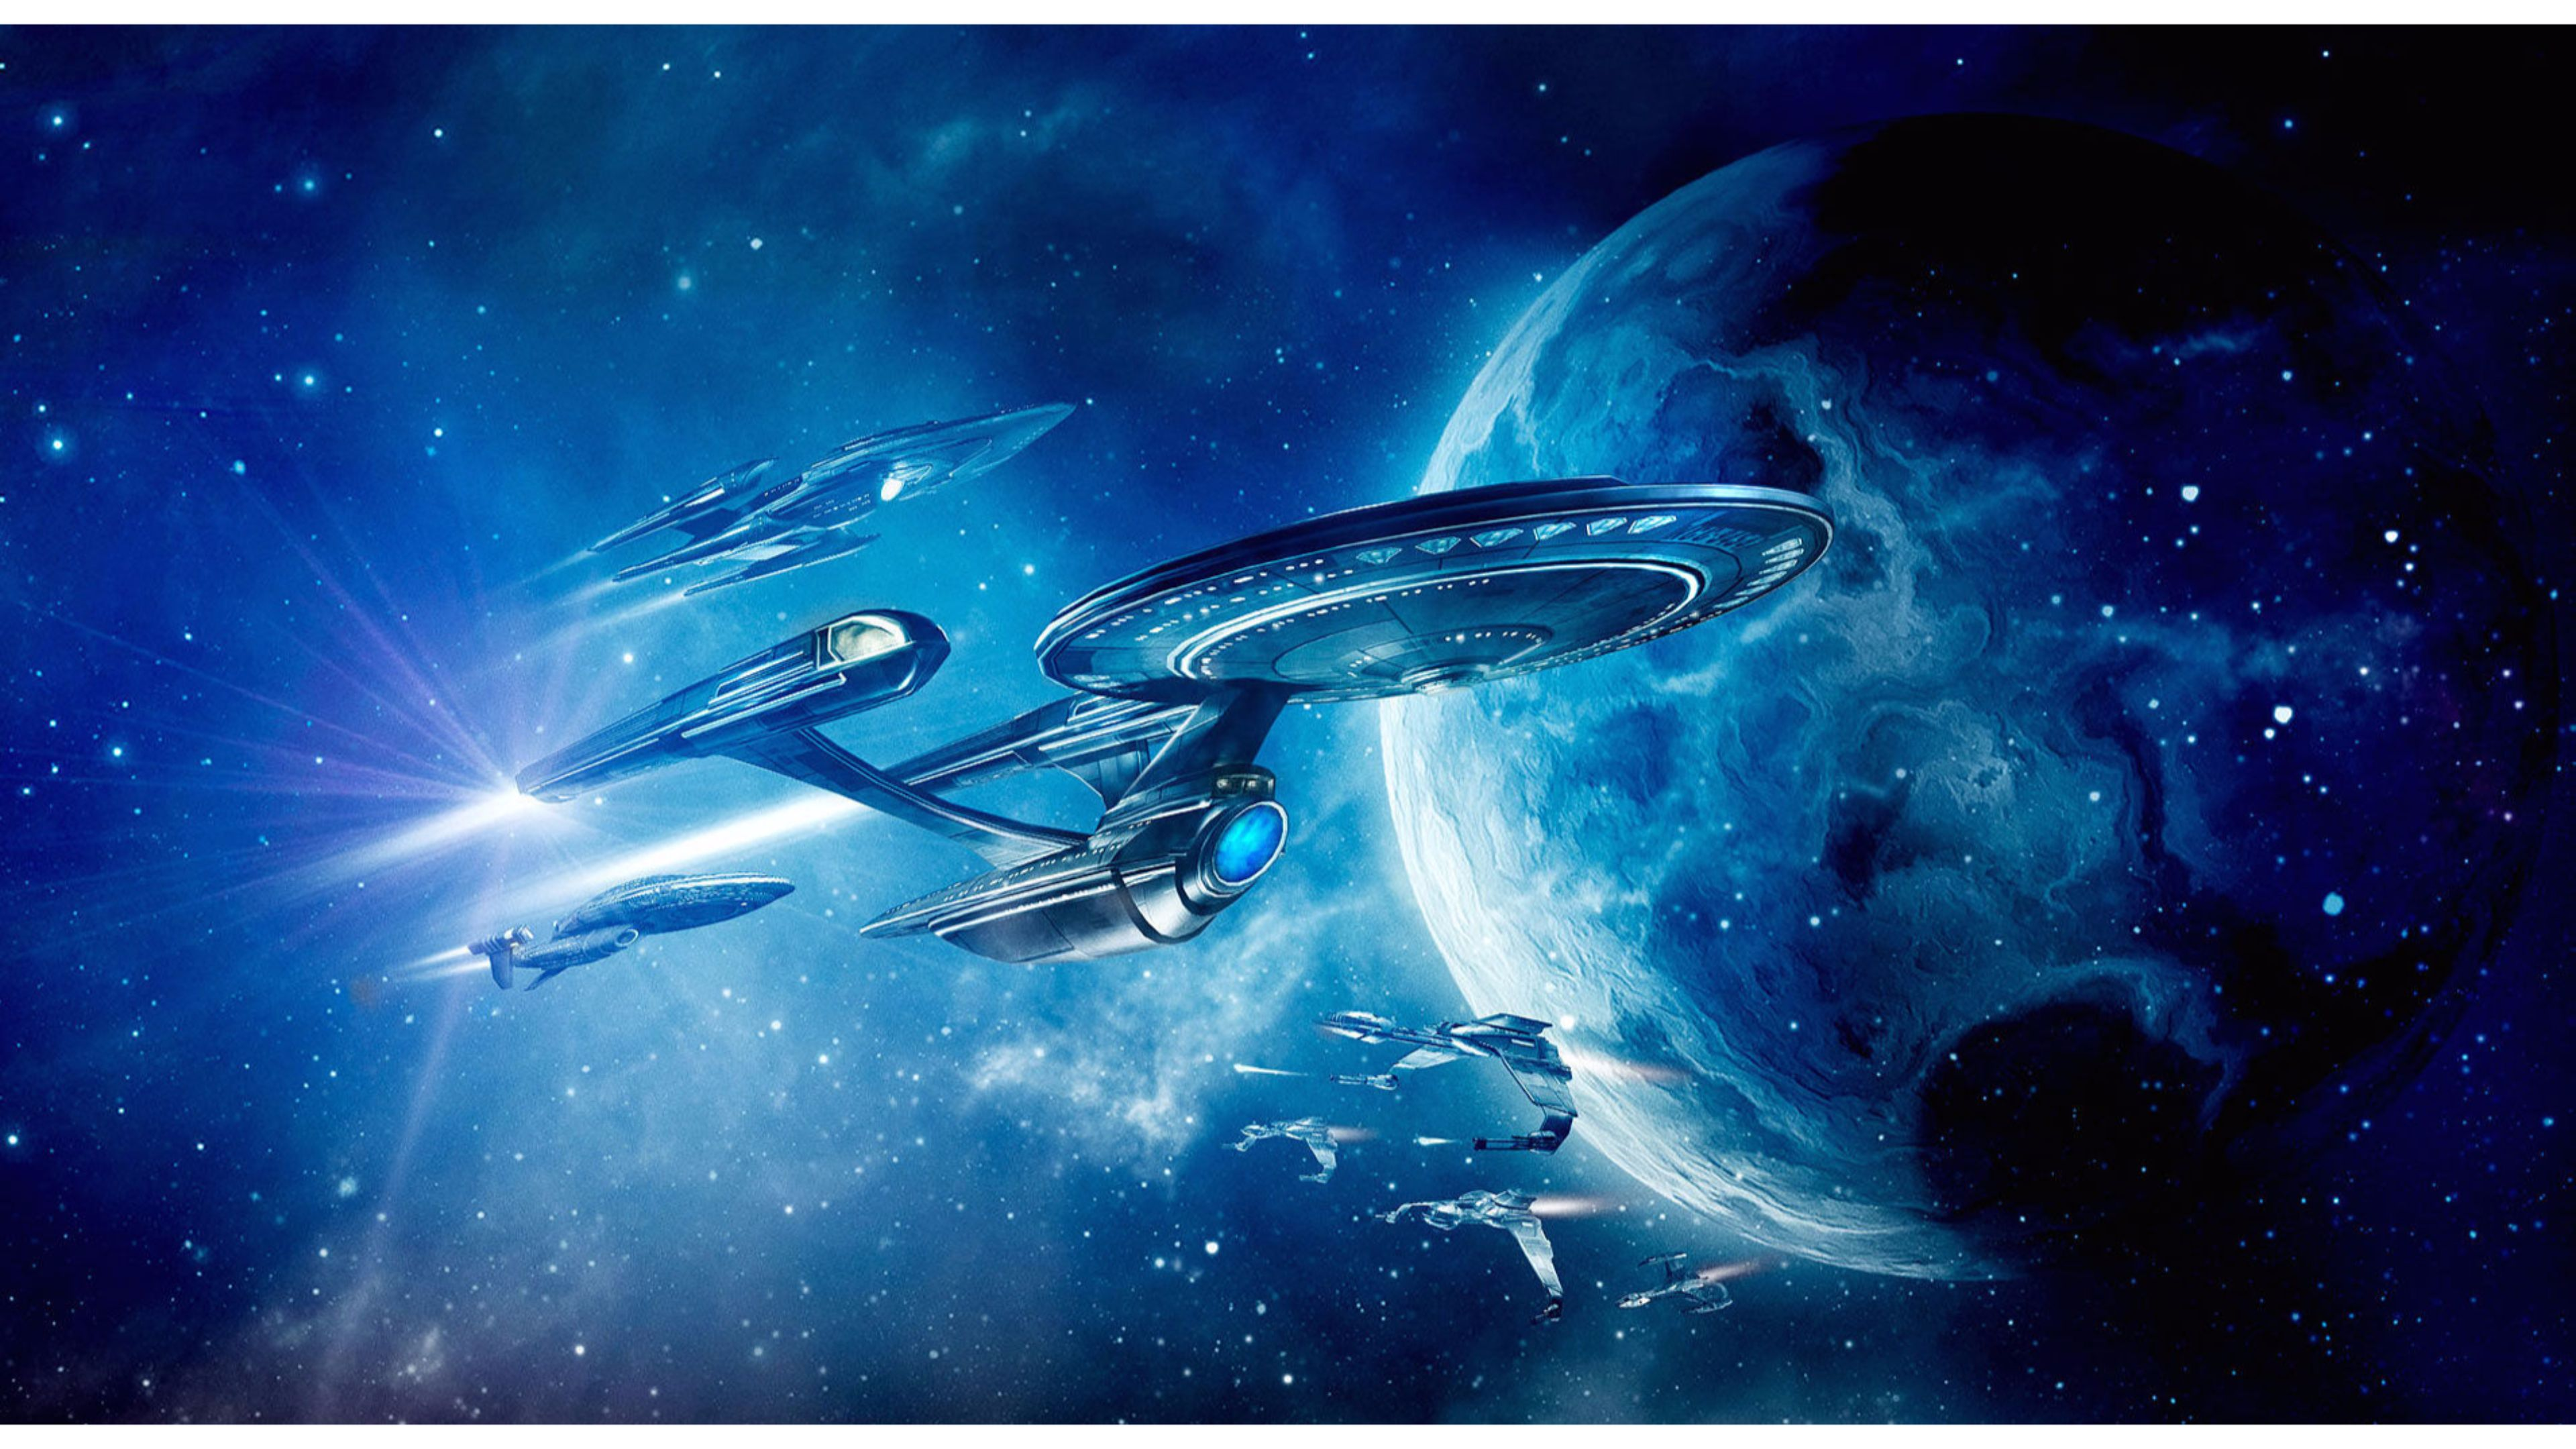 Star Trek Full HD Quality Wallpapers Star Trek Wallpaper 3840x2160